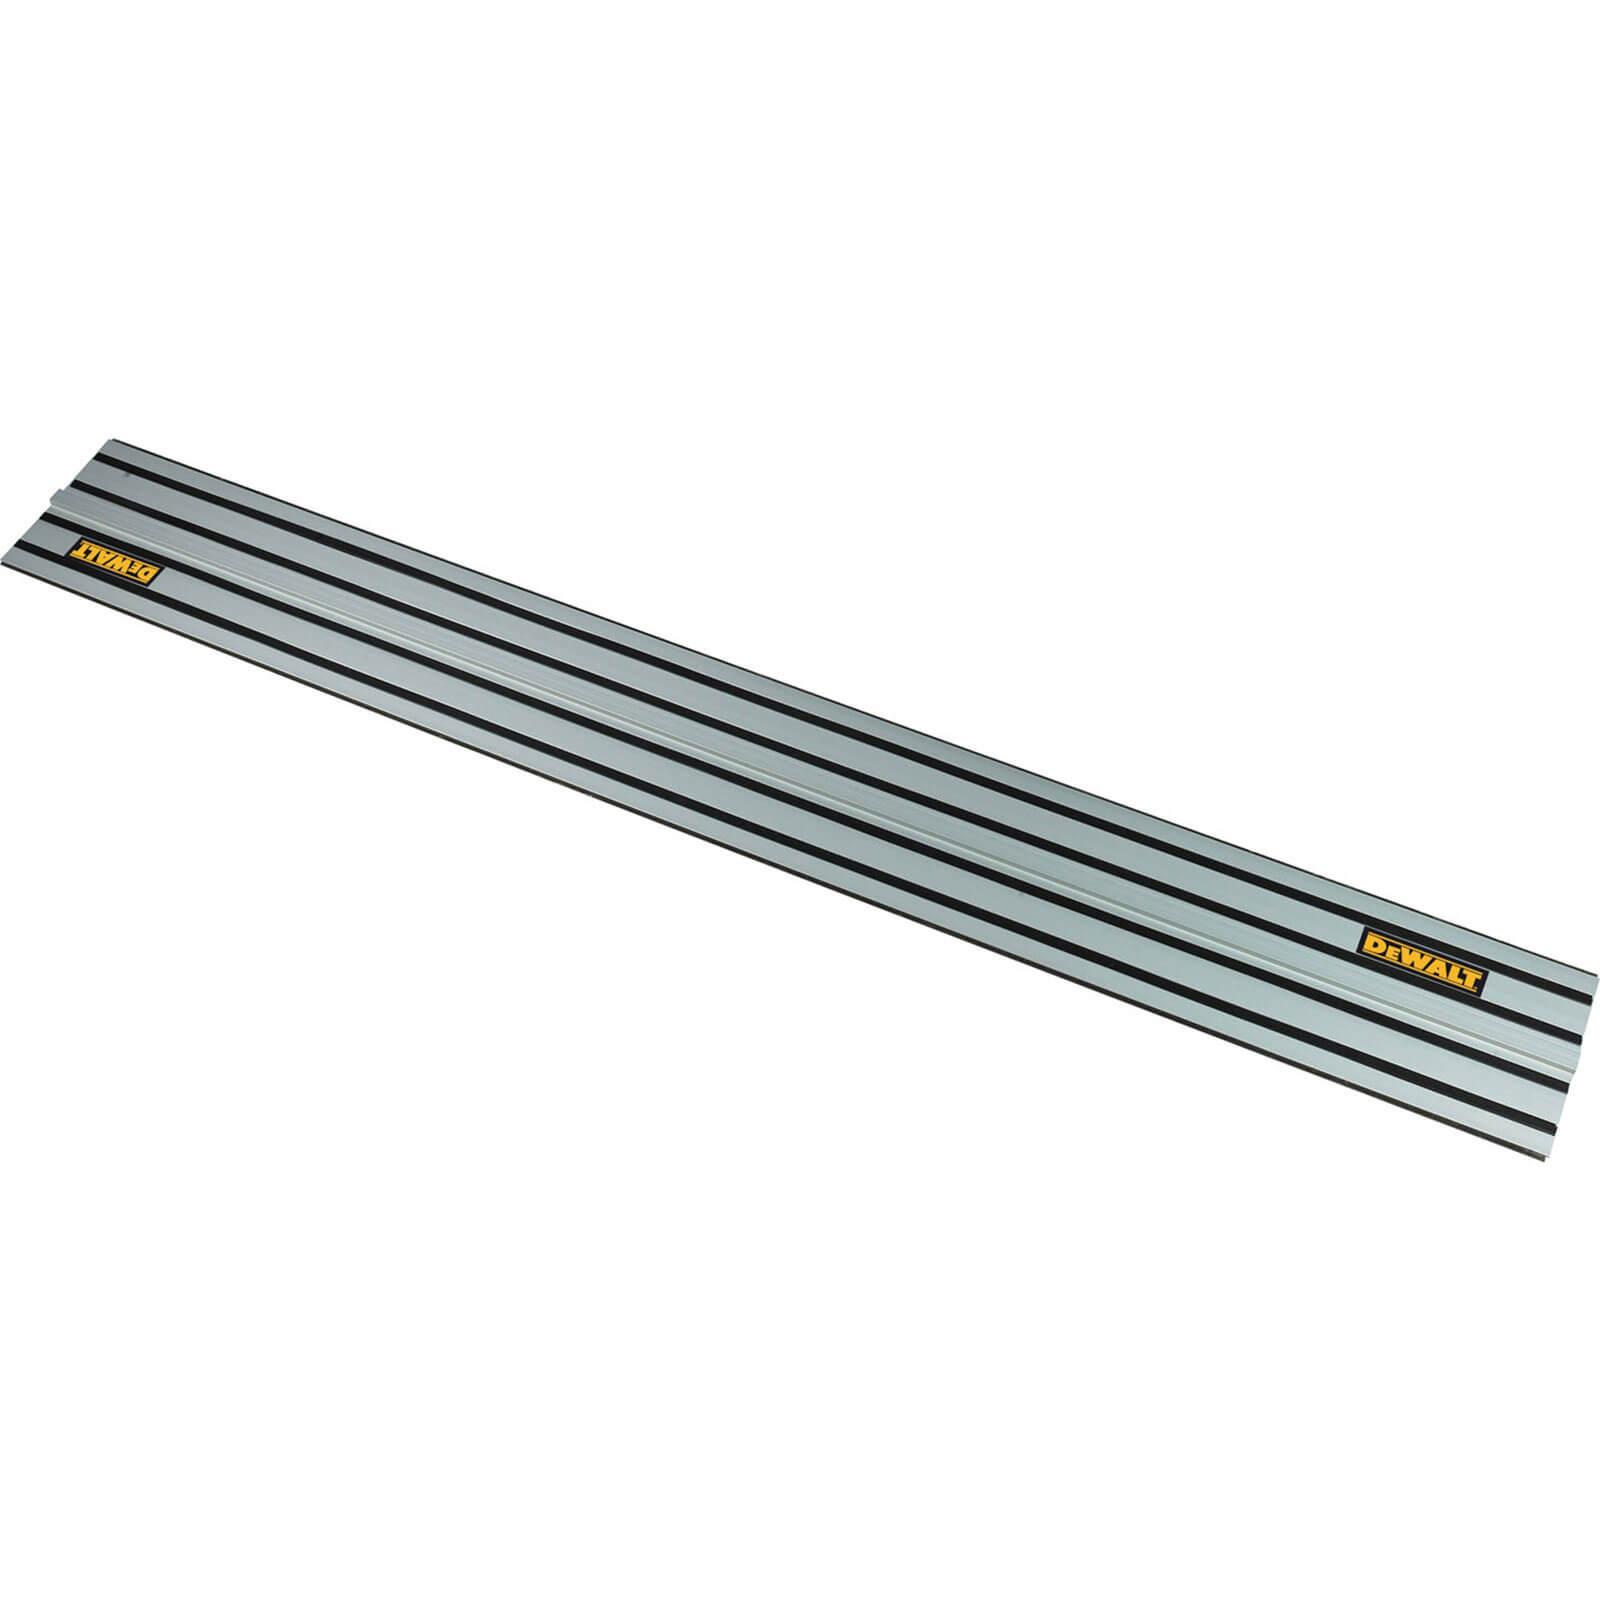 Image of DeWalt DWS5022 Plunge Saw Guide Rail 1500mm